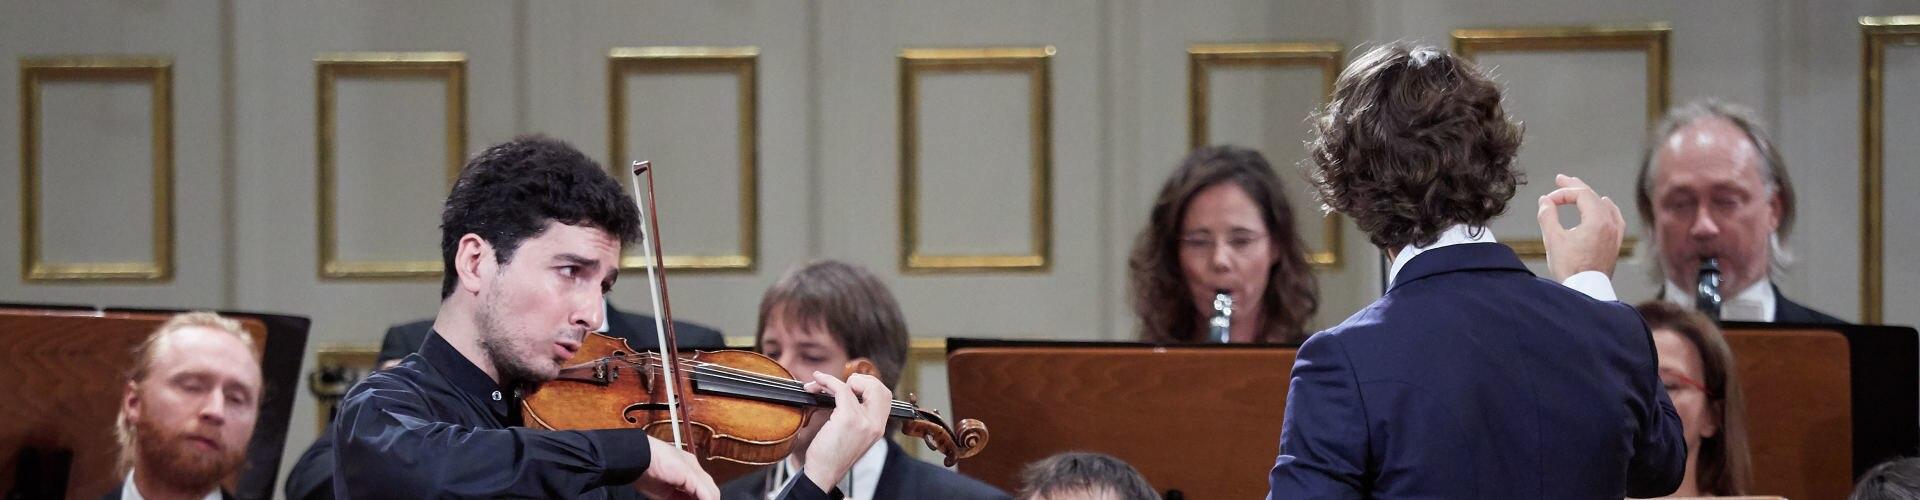 Watch Lorenzo Viotti Conducts... Online